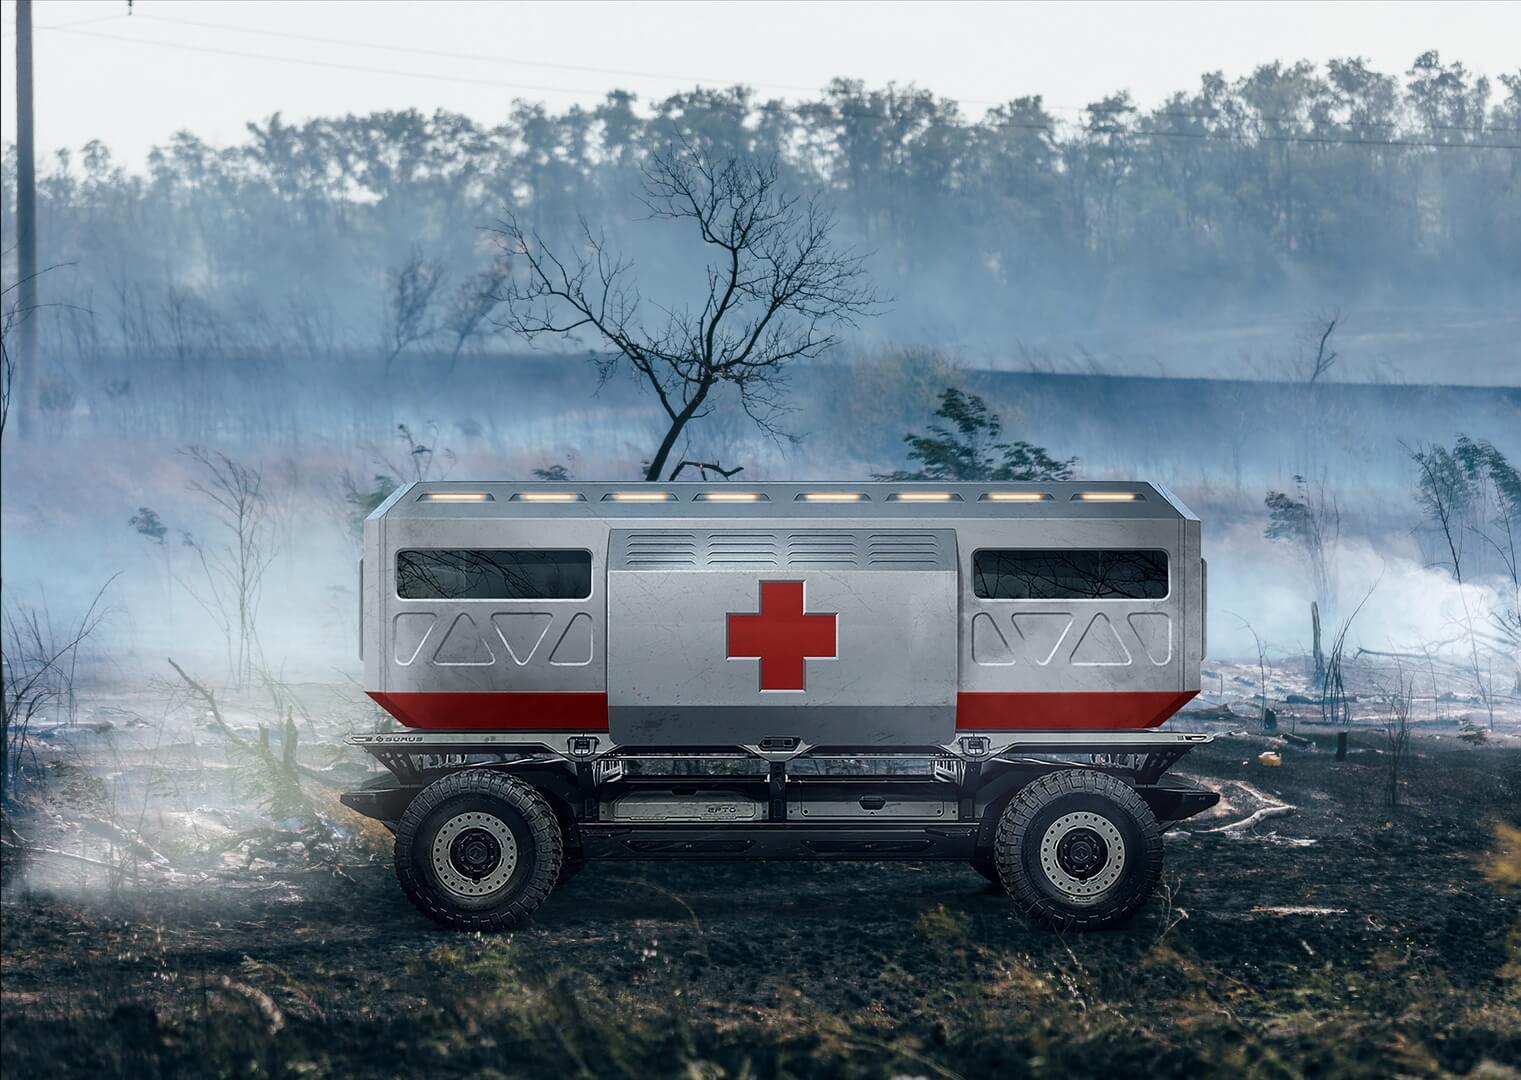 Автономная платформа-грузовик SURUS